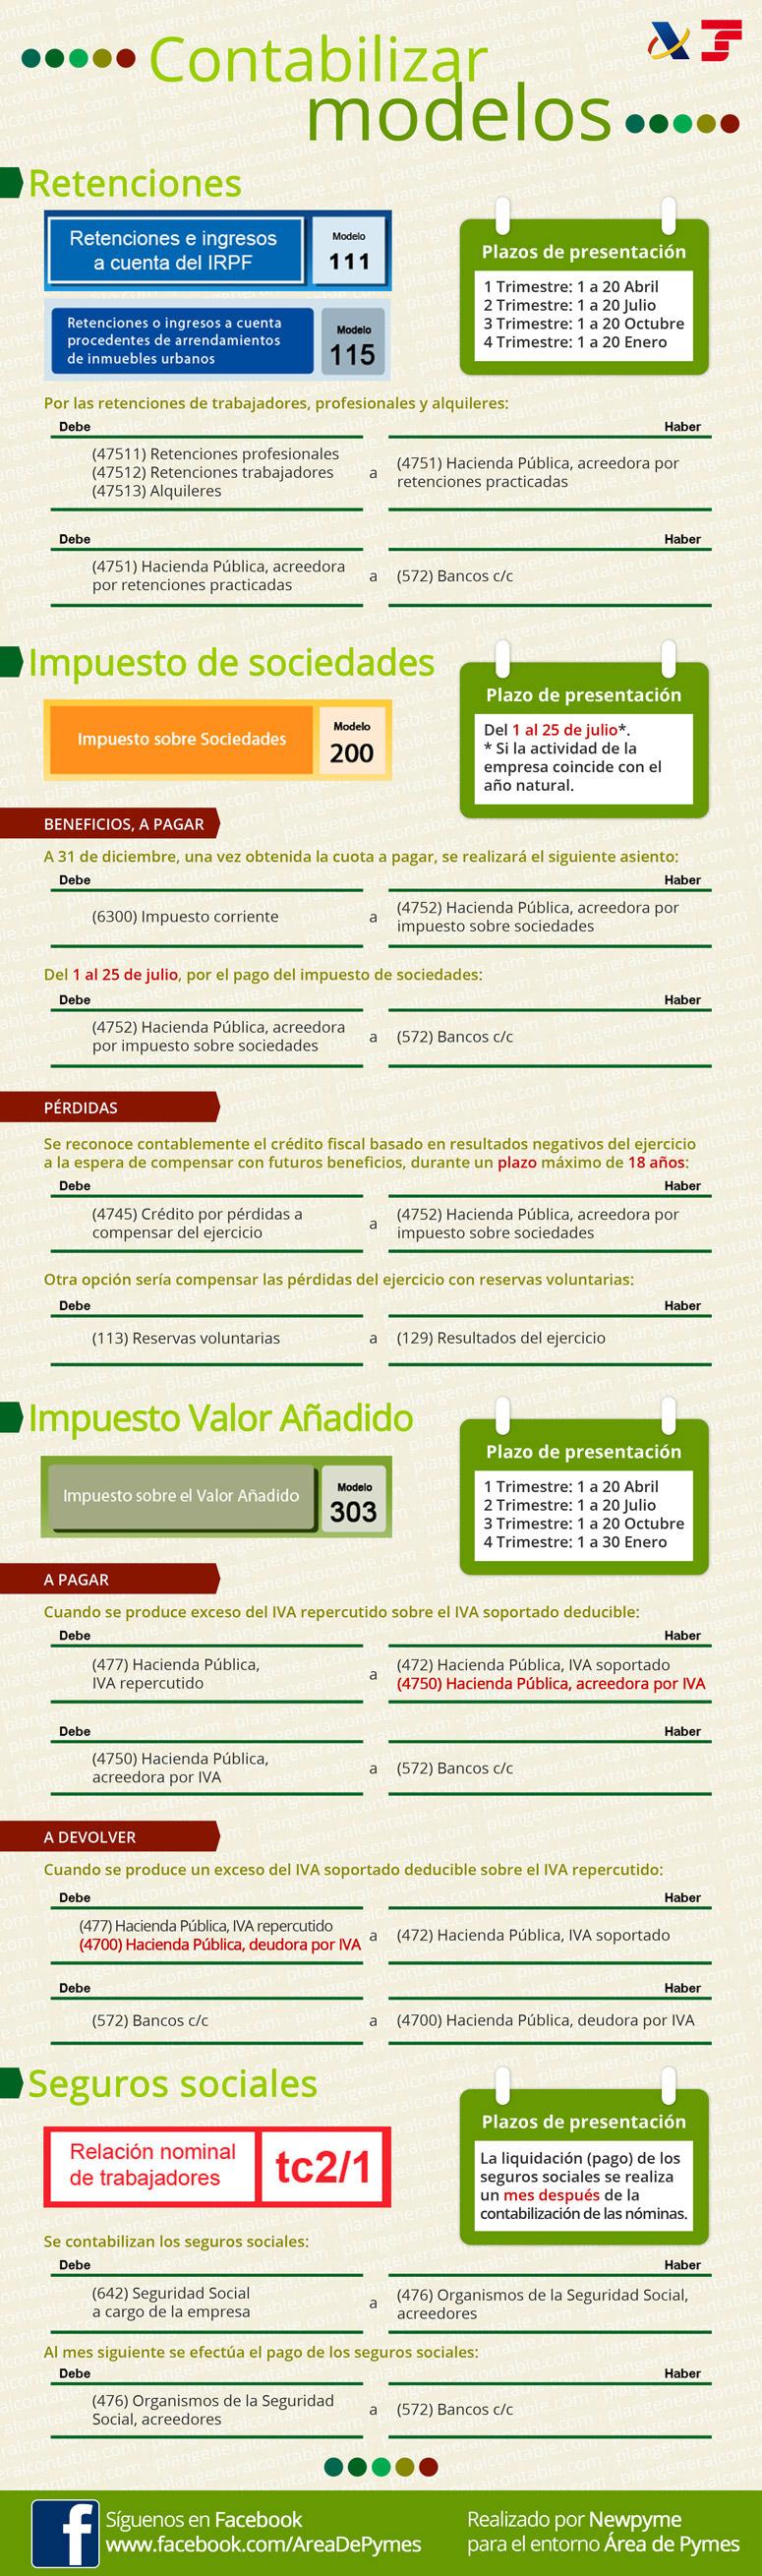 infografia resumen de contabilizaci n de modelos de